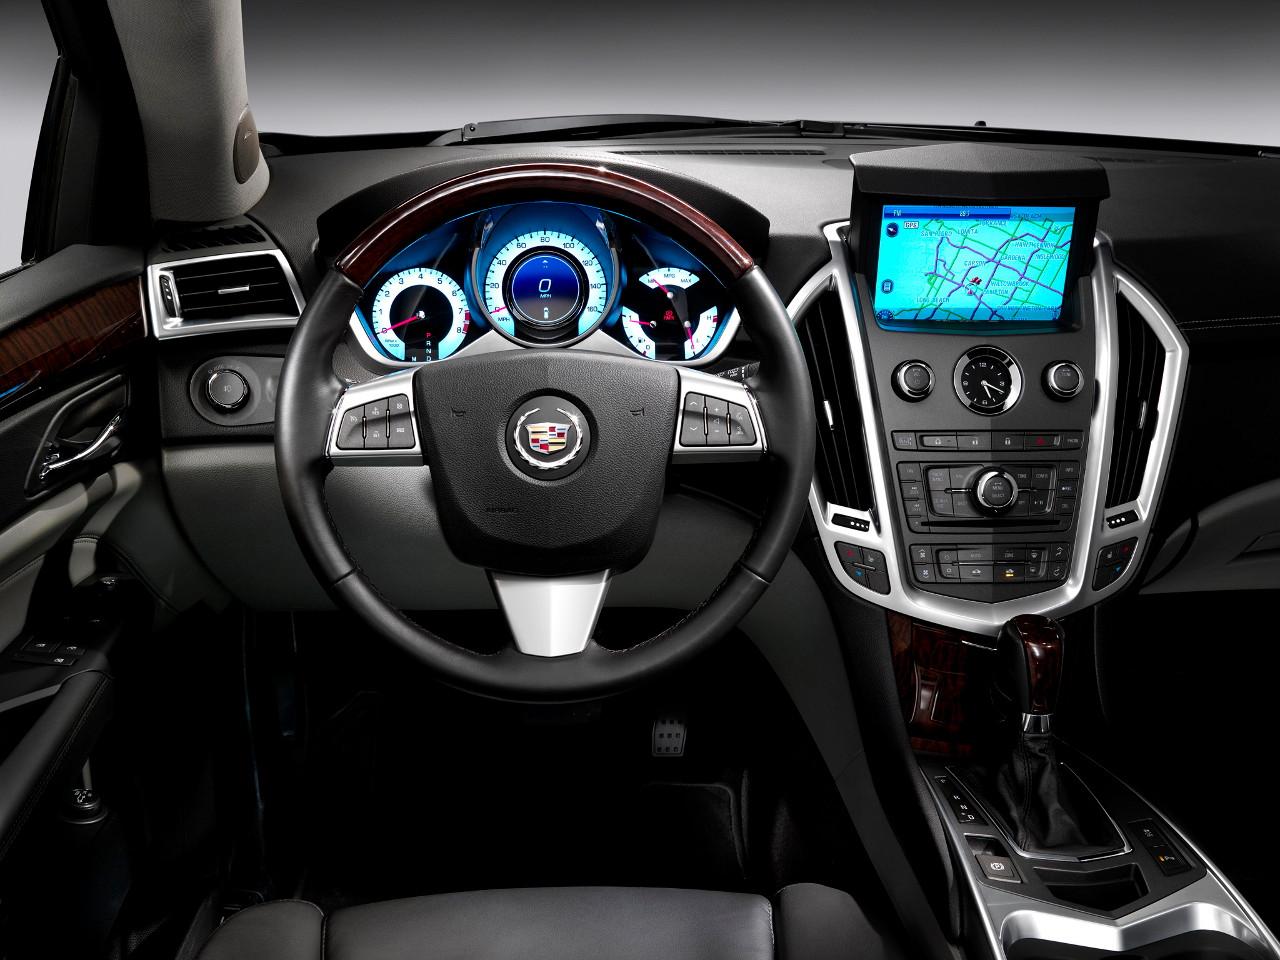 Салон Cadillac SRX 2012